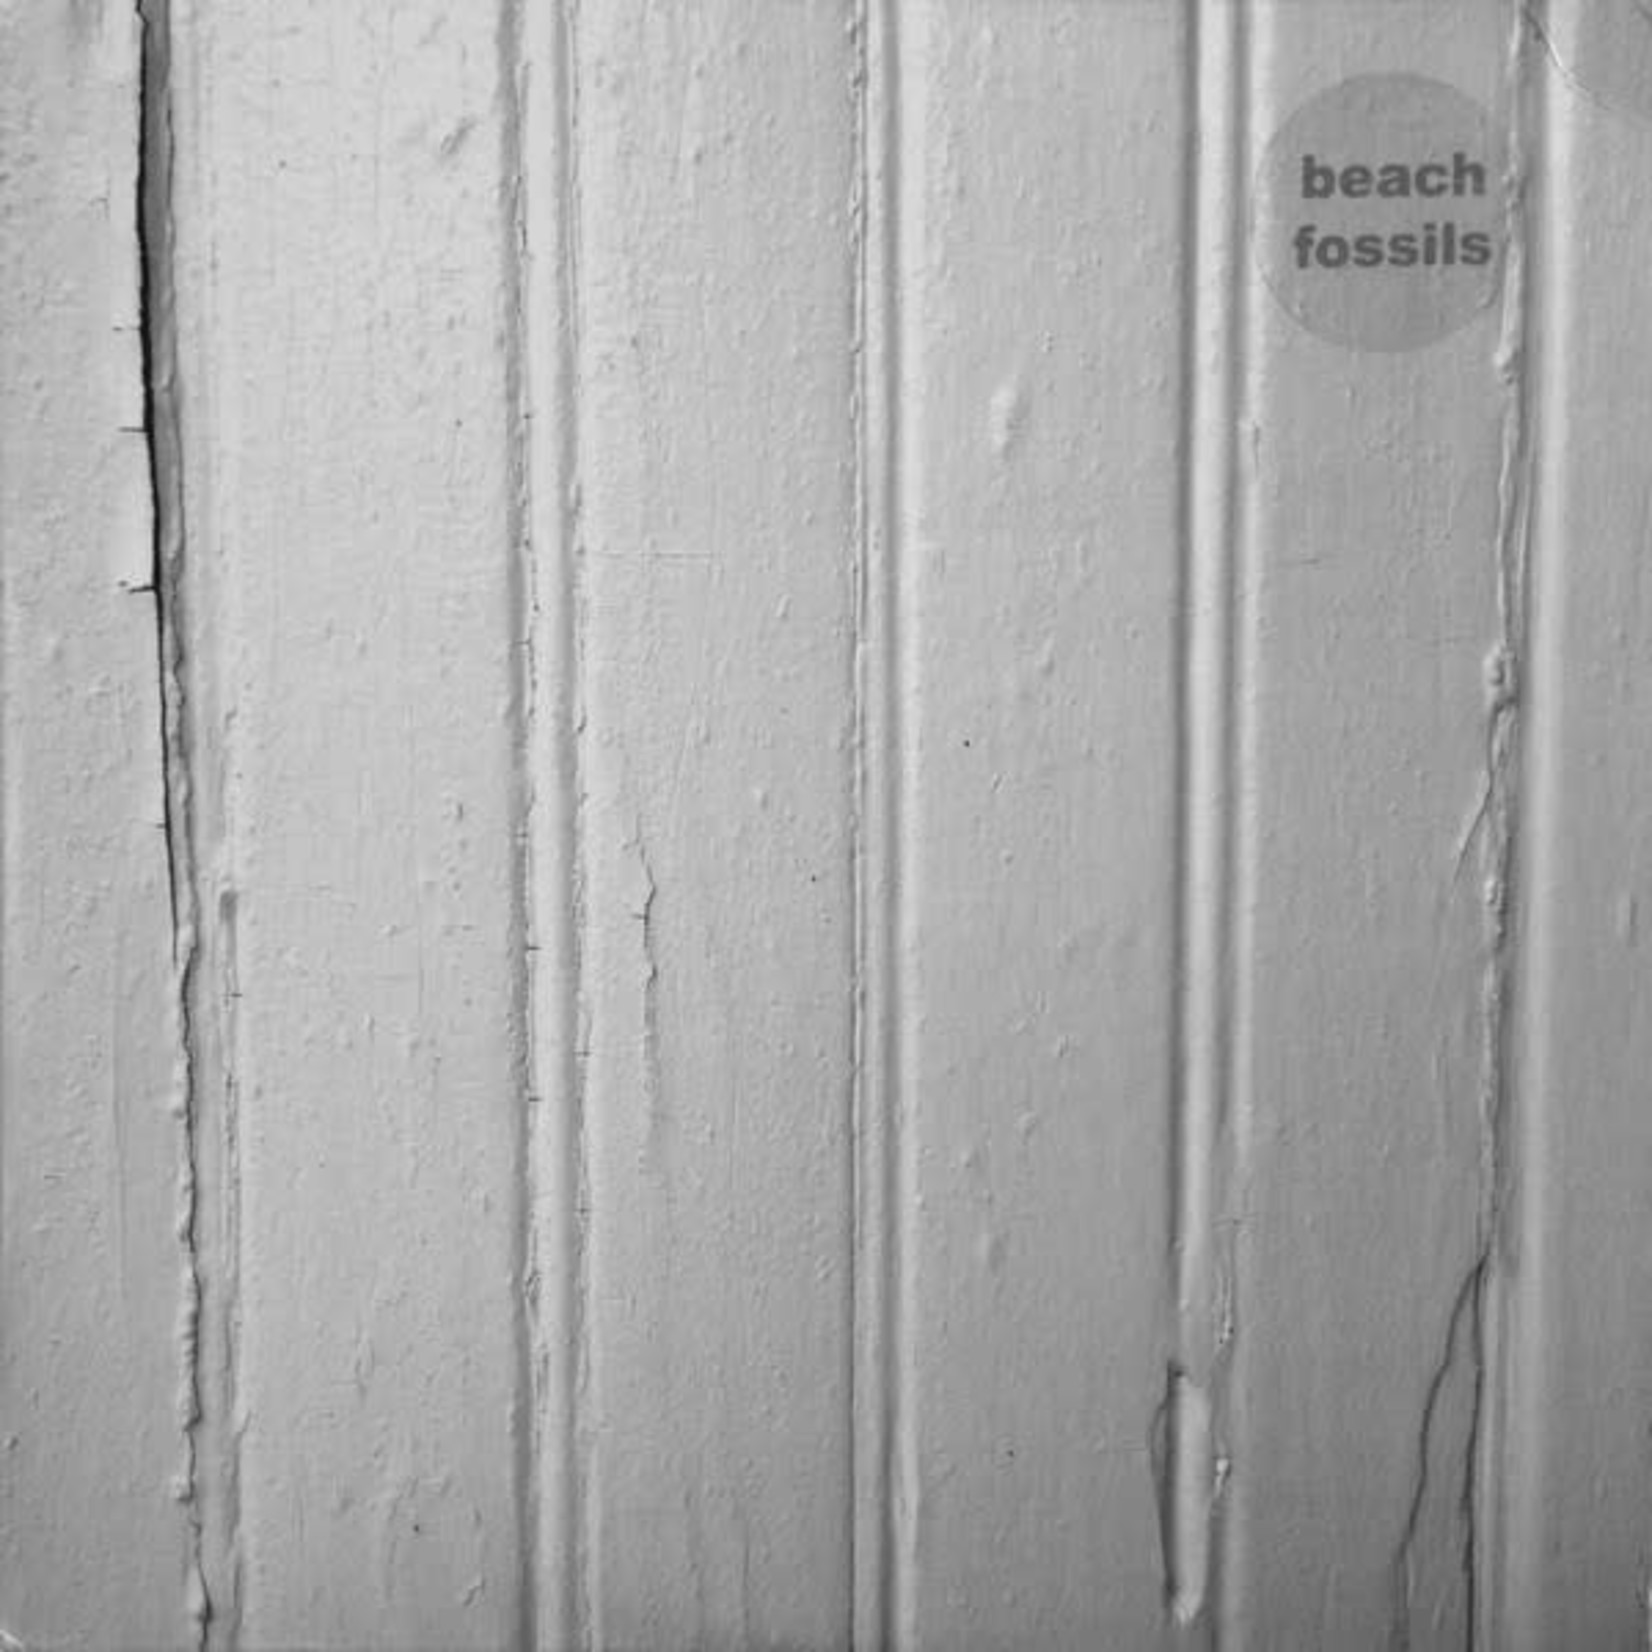 [New] Beach Fossils: self-titled (clear green vinyl)